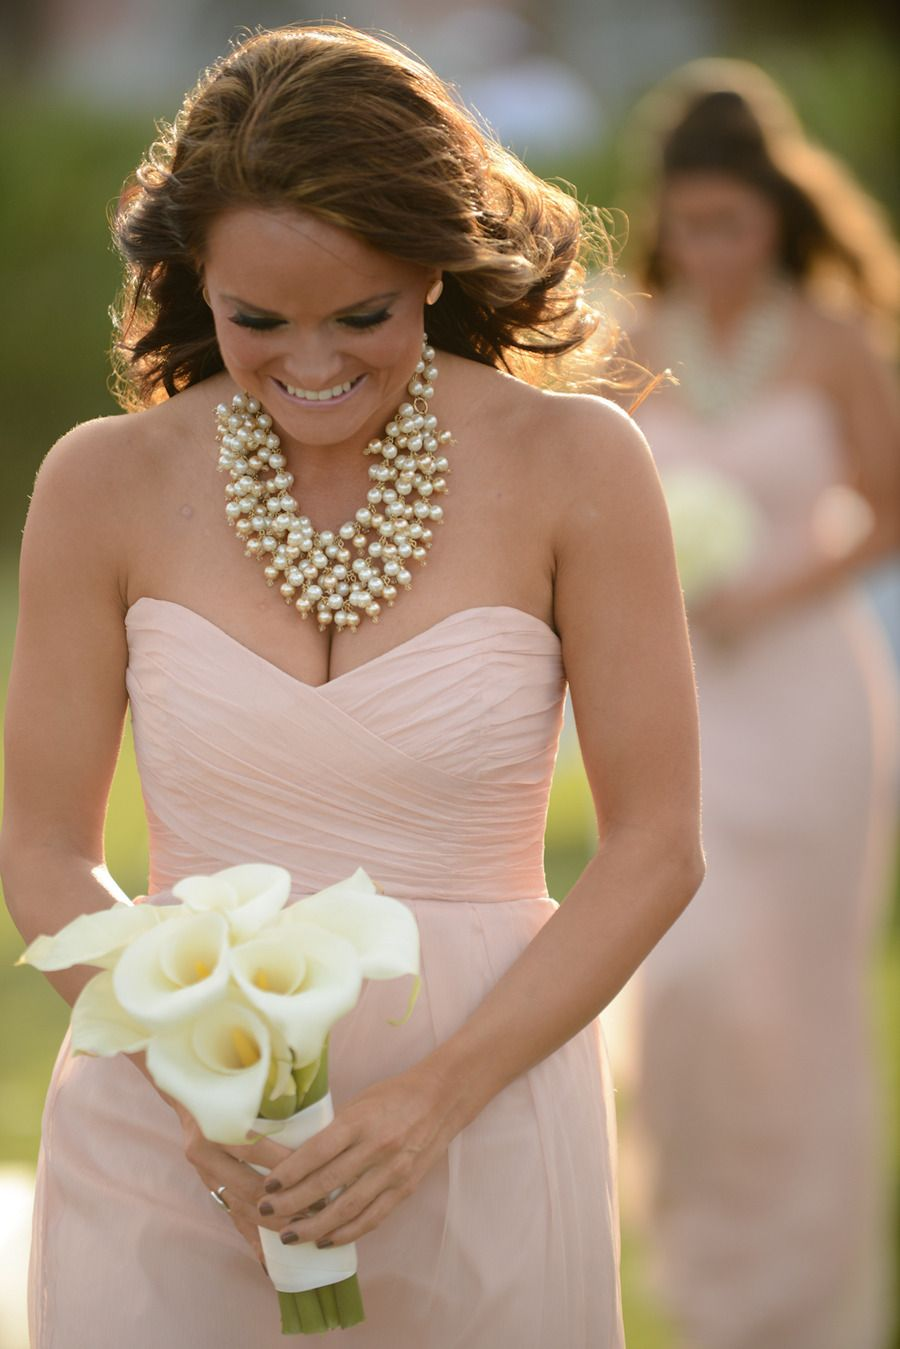 Gorgeous Bridesmaid Look Blush Bridesmaid Dress Simple Calla